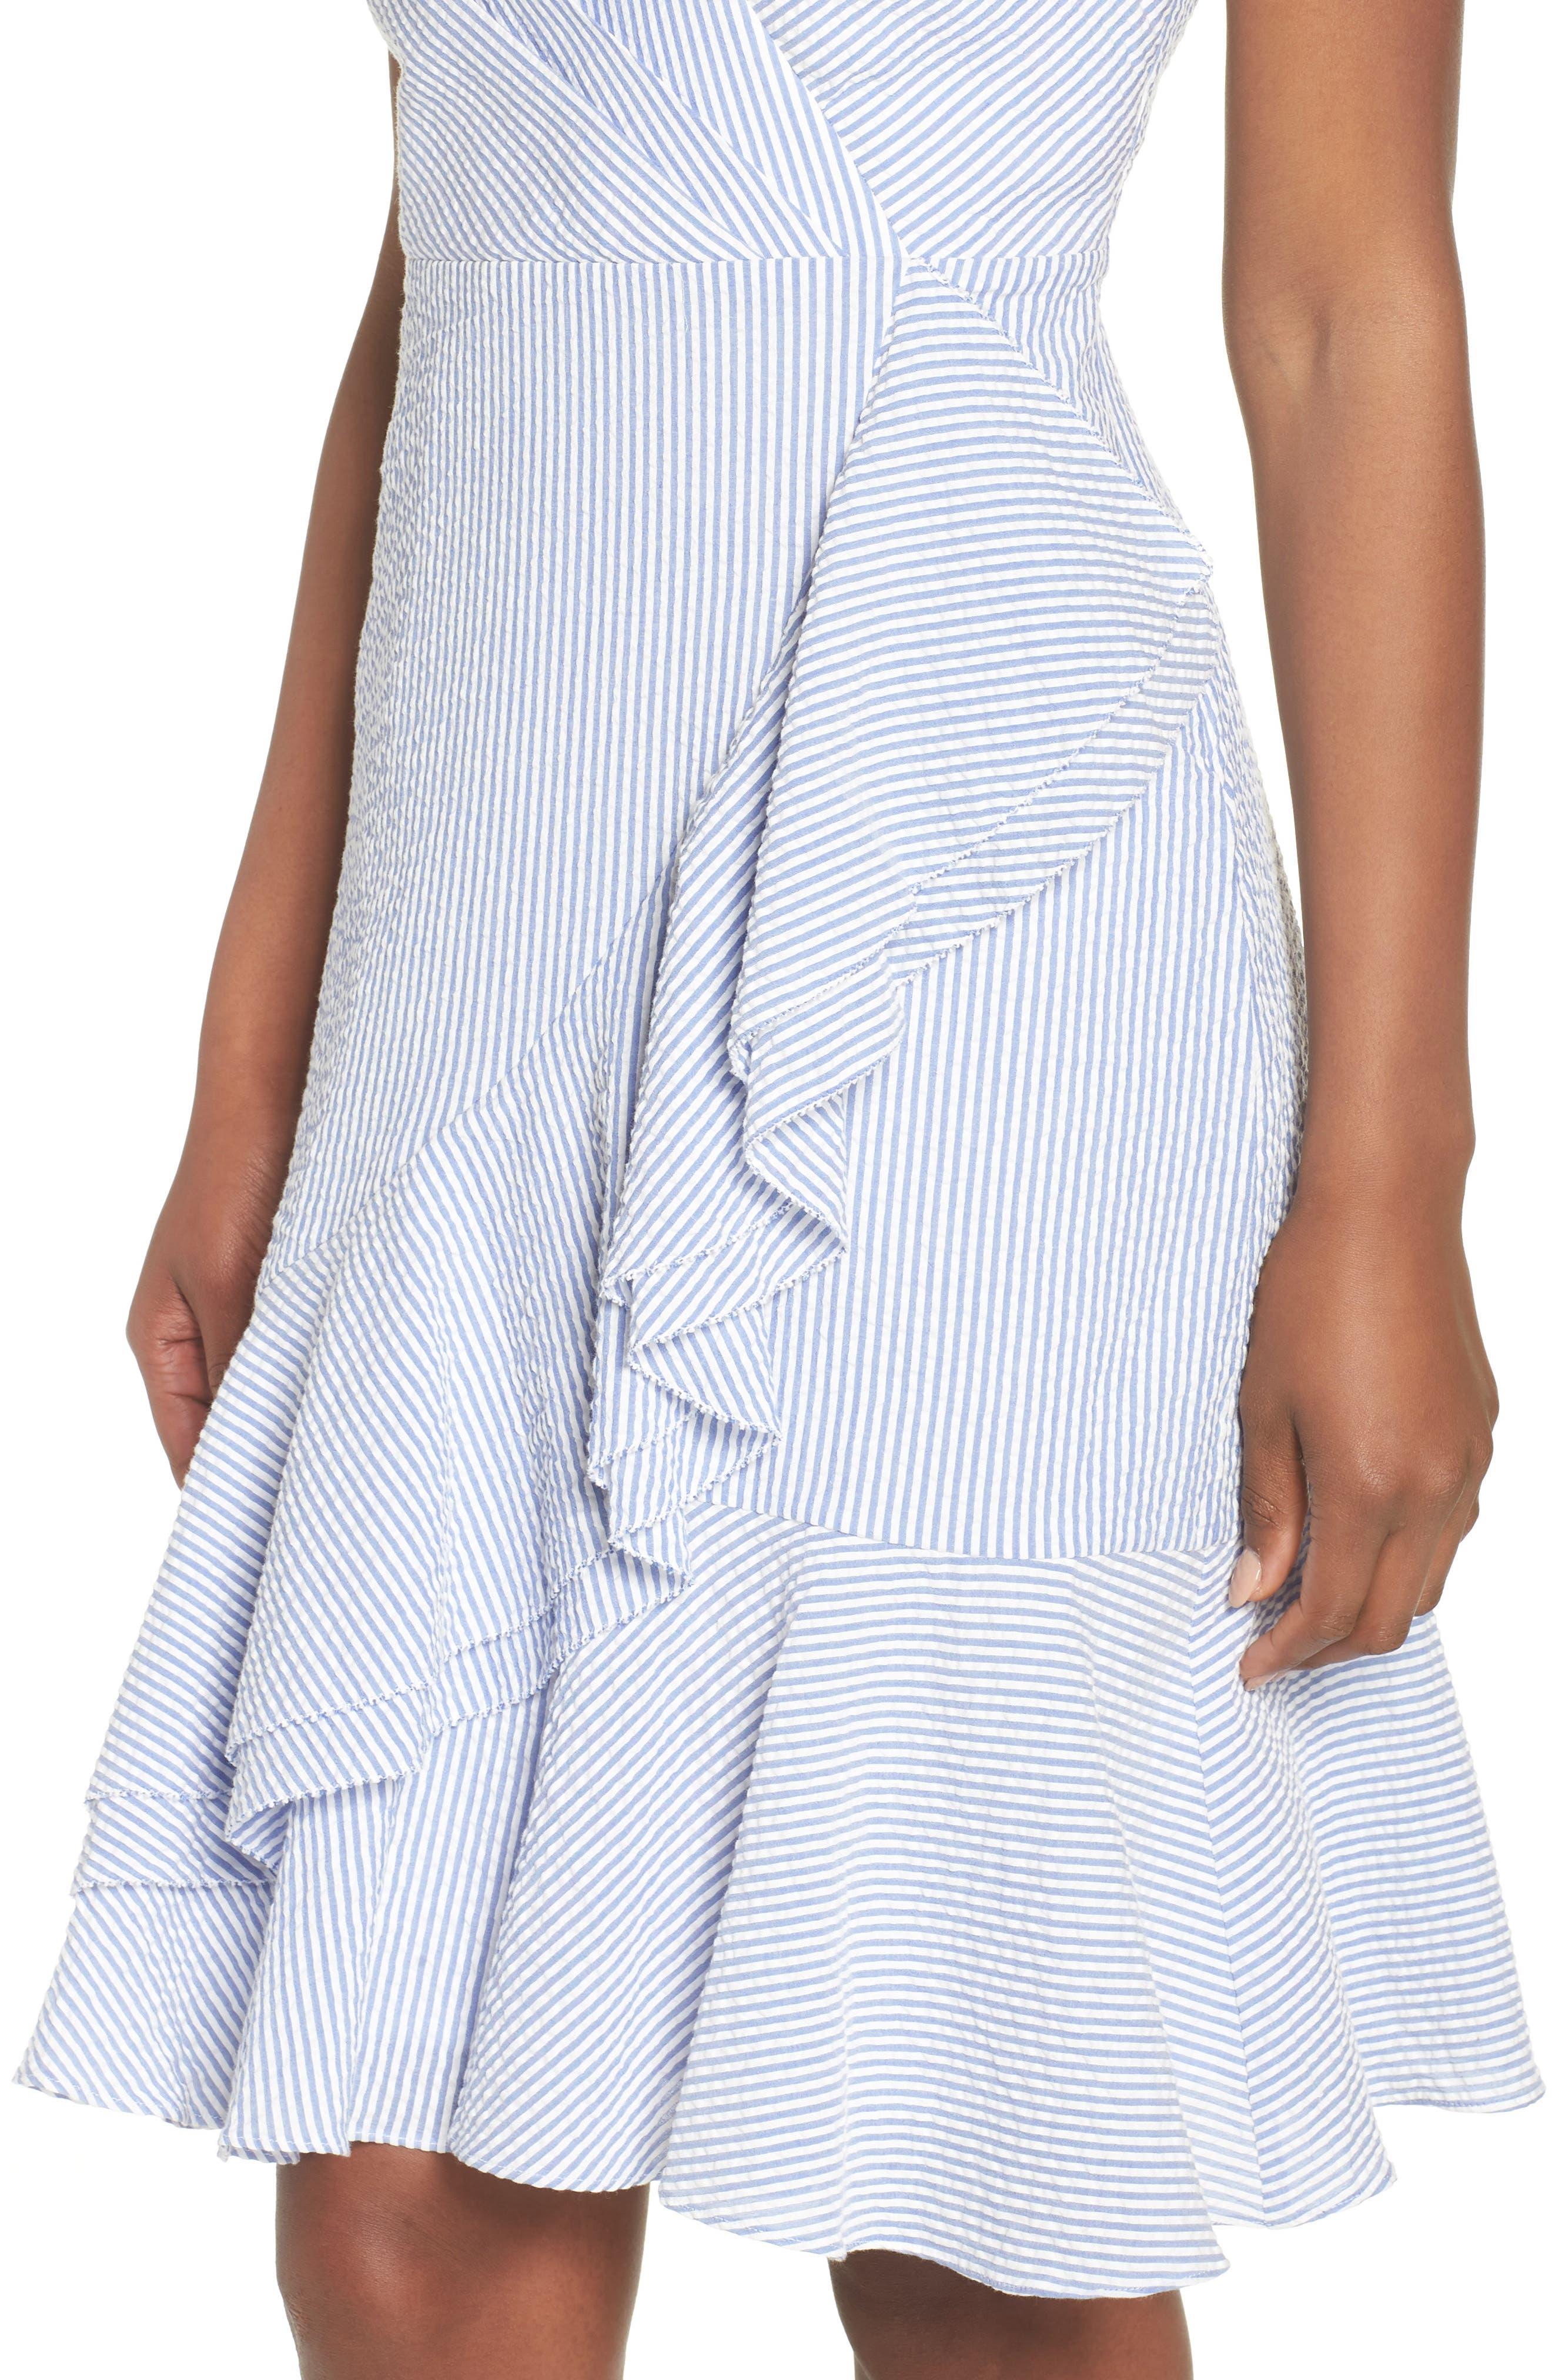 J.Crew Spaghetti Strap Ruffle Dress,                             Alternate thumbnail 4, color,                             Blue White